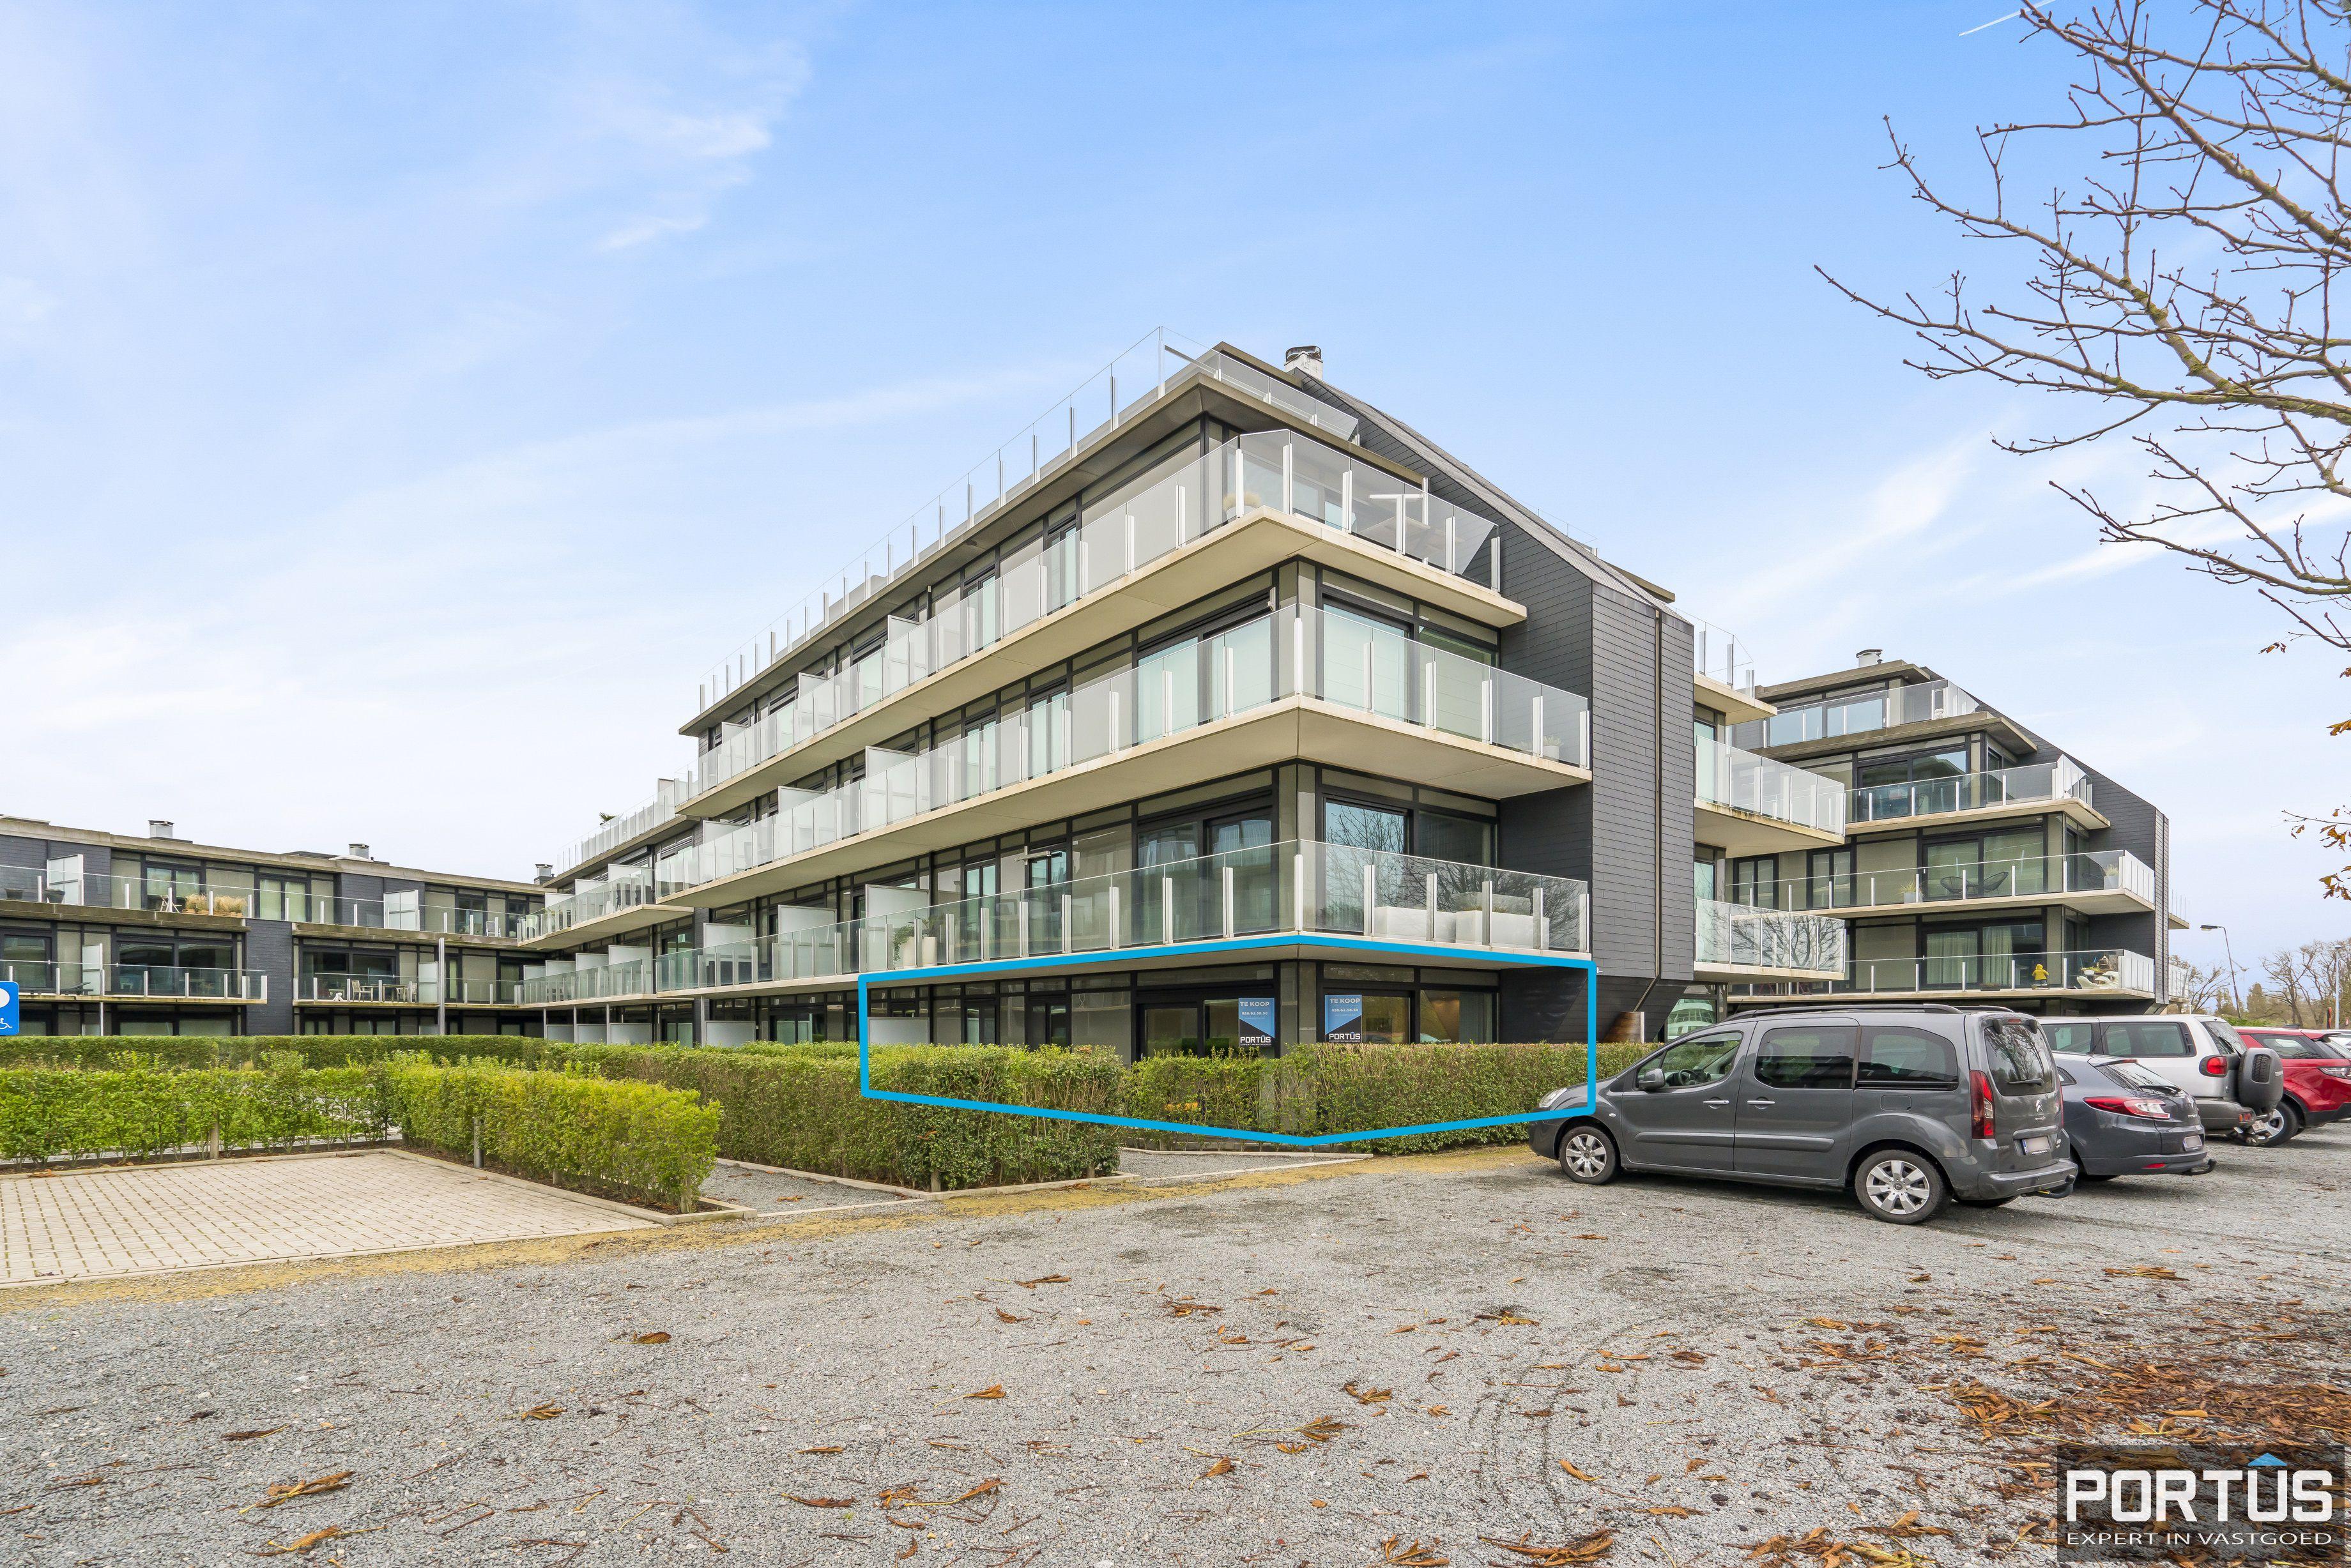 Appartement te koop met 2 slaapkamers in Residentie Waterfront te Nieuwpoort - 11873